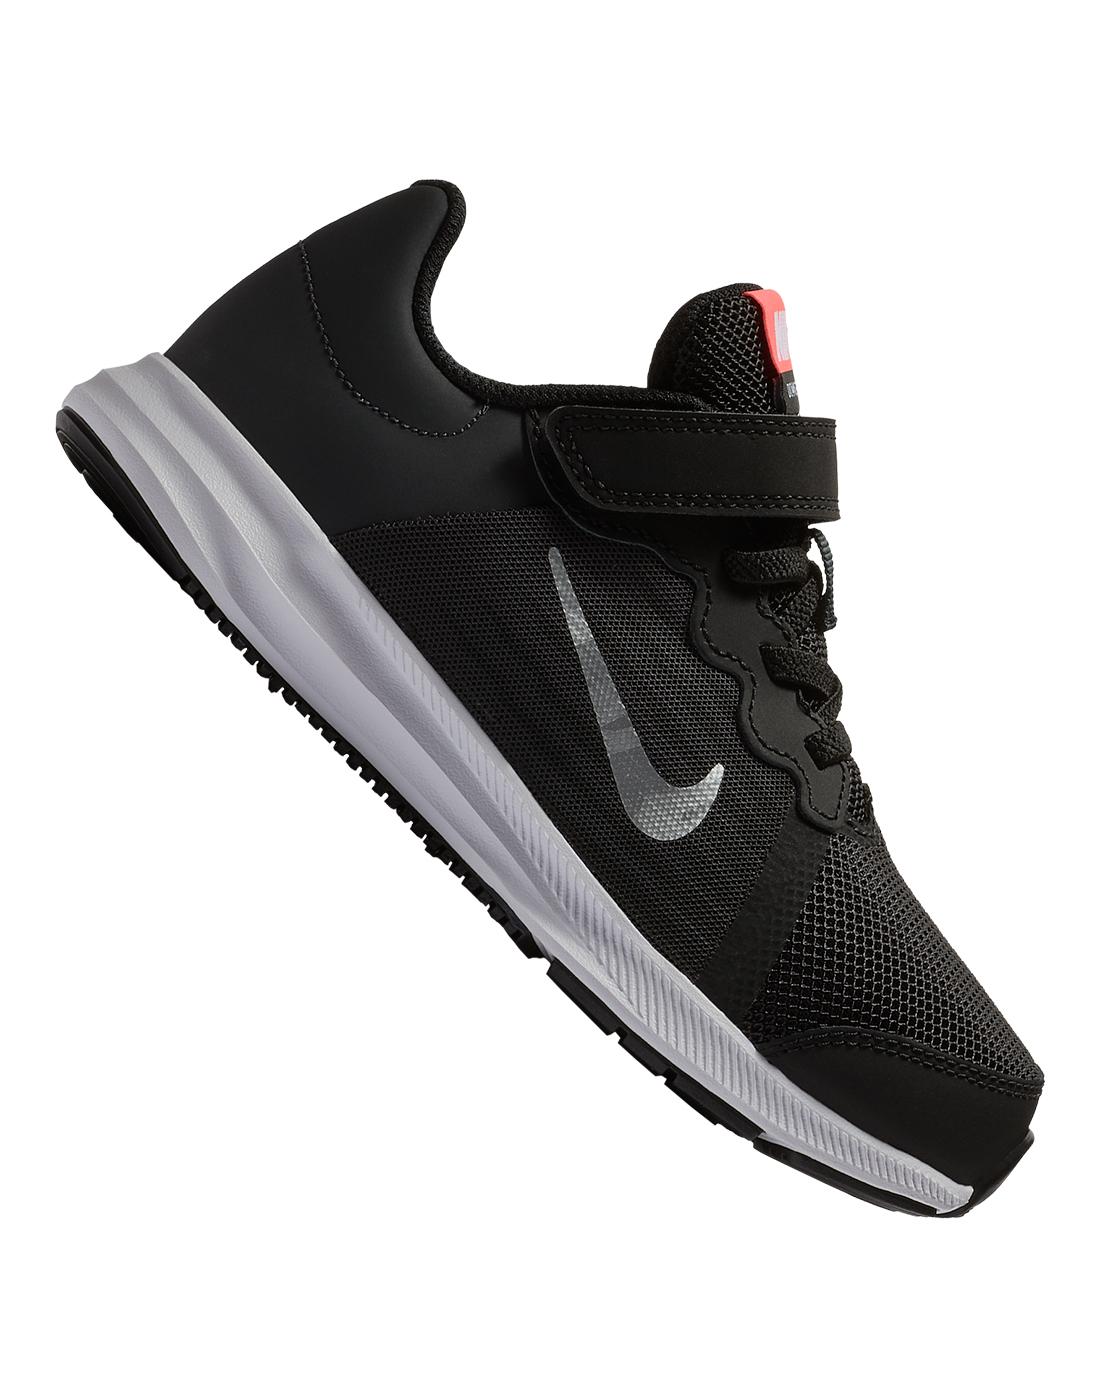 10e5cb8e48 Nike Younger Girls Downshifter 8 | Life Style Sports